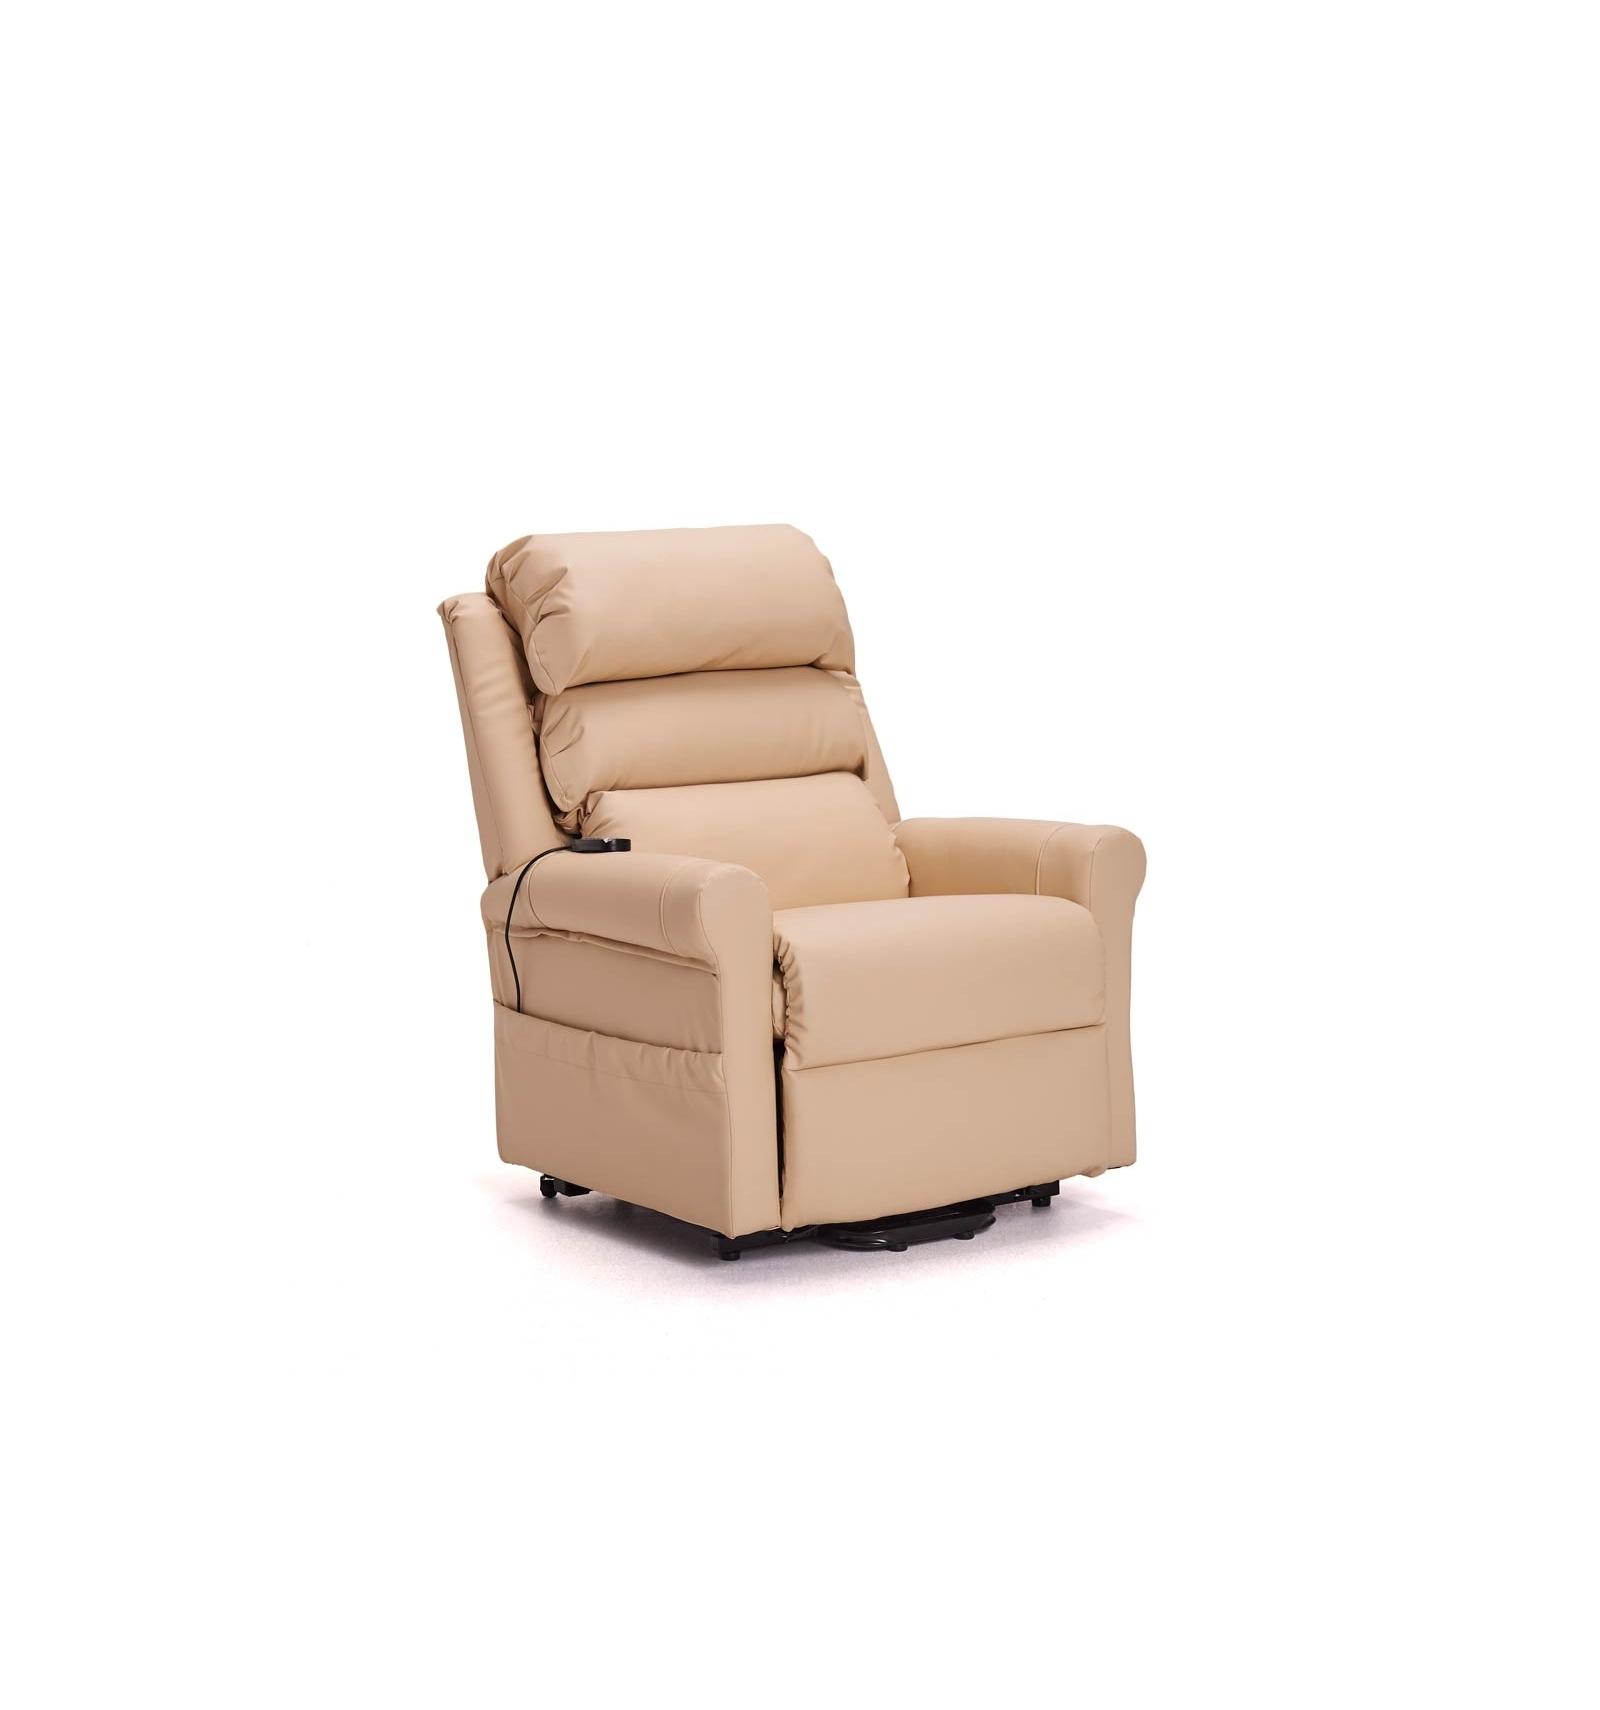 ruhesessel aufstehhilfe. Black Bedroom Furniture Sets. Home Design Ideas